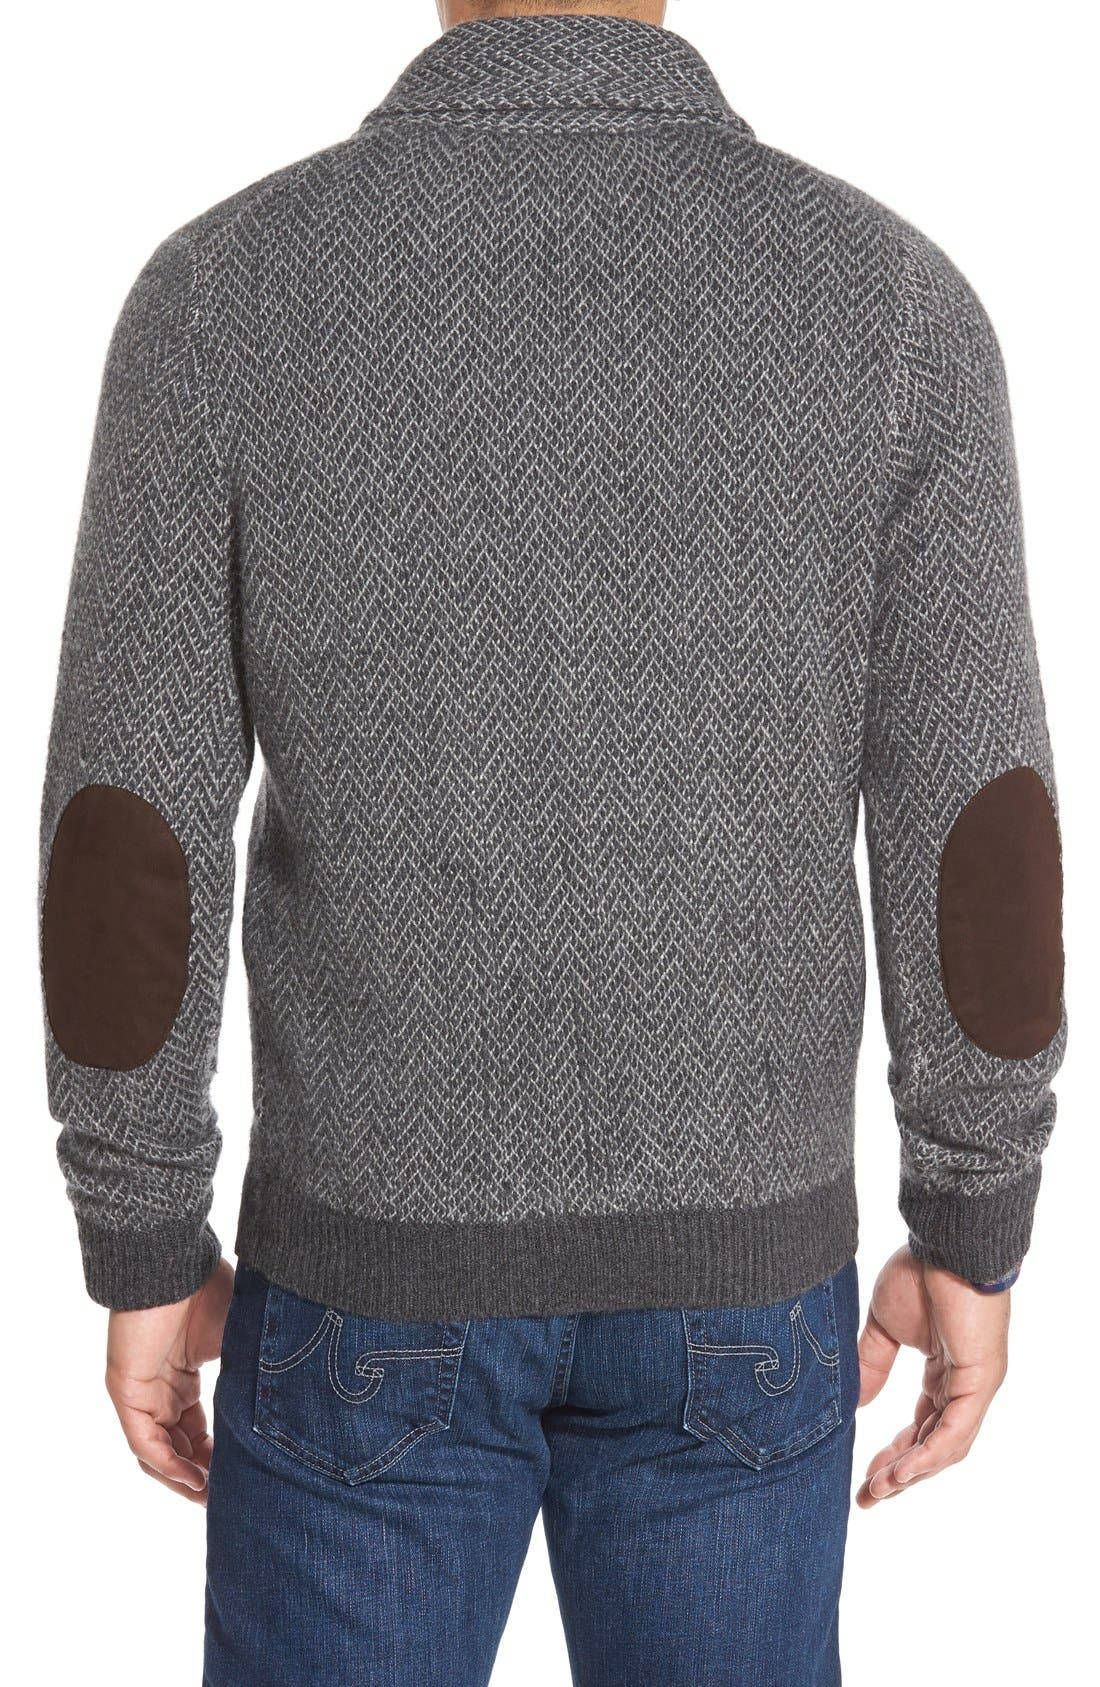 Alternate Image 2  - John W. Nordstrom® Shawl Collar Cashmere Sweater (Regular & Tall)